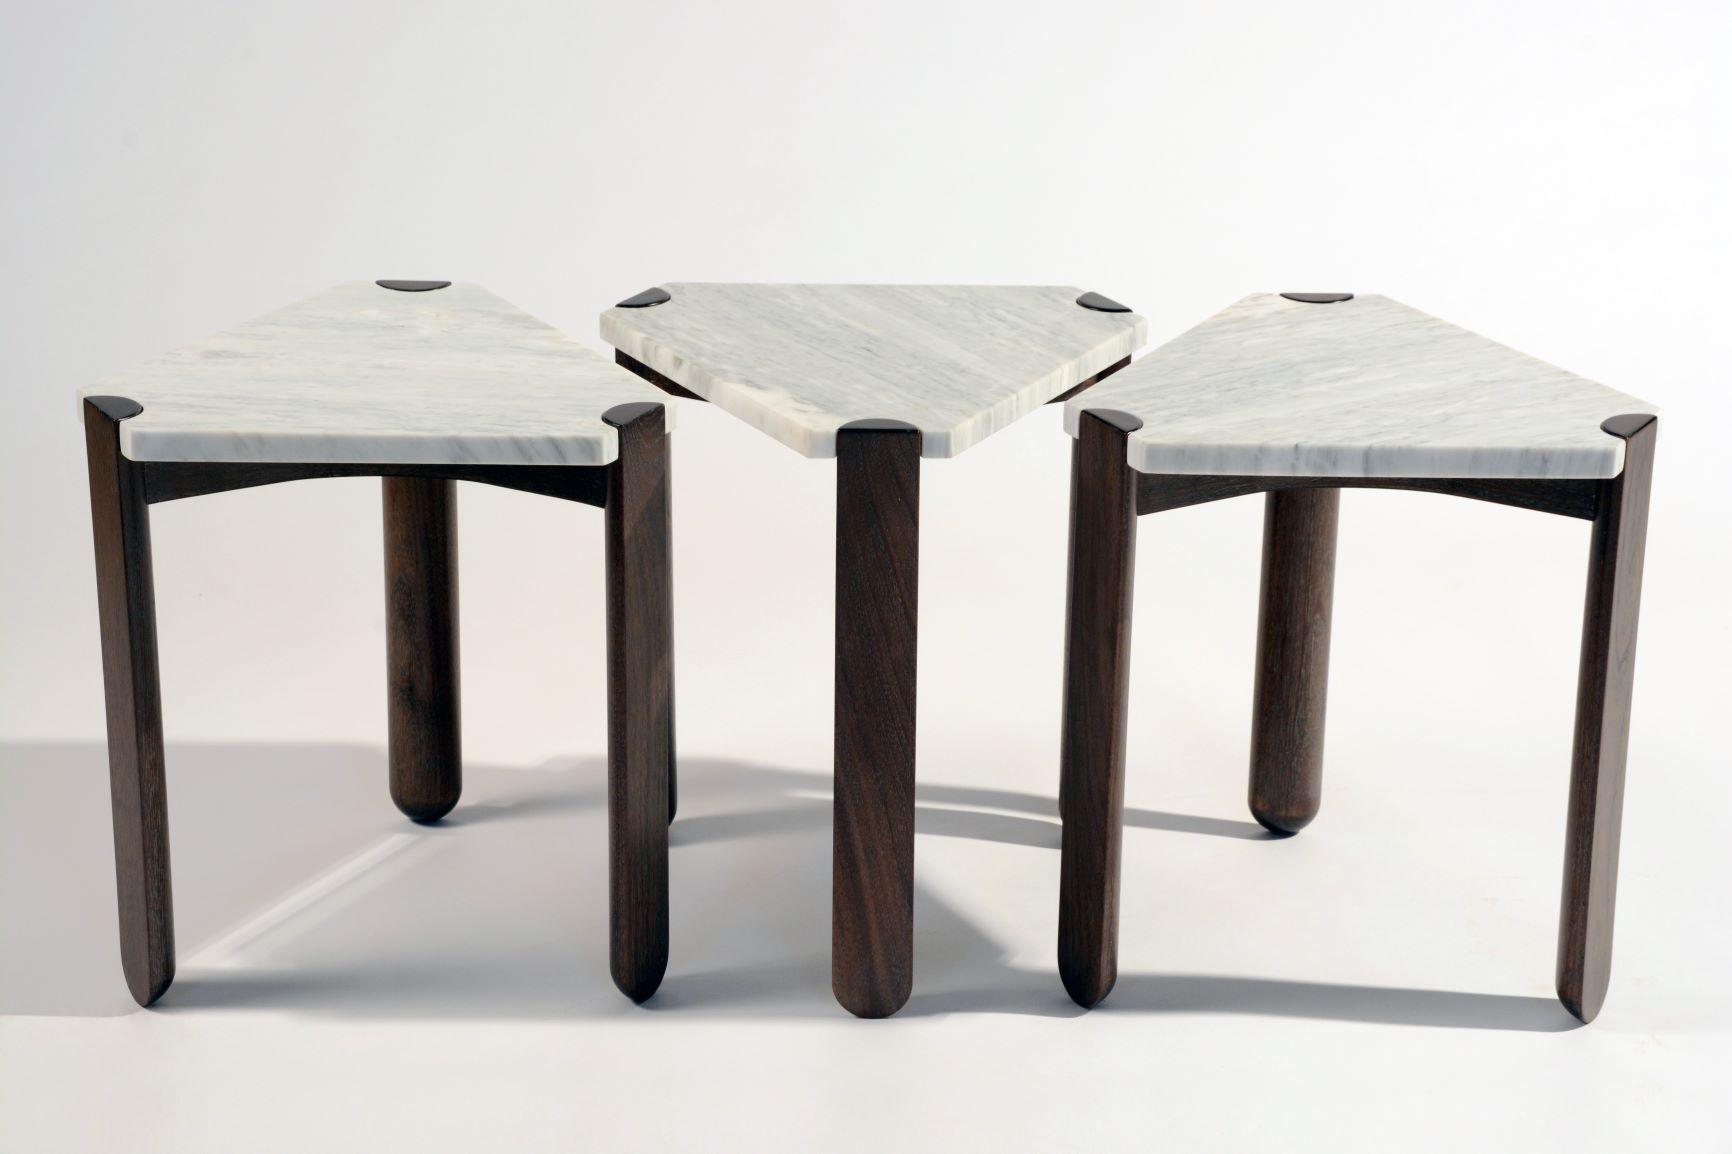 Matthew Fairbank - Halcyon Table Triple